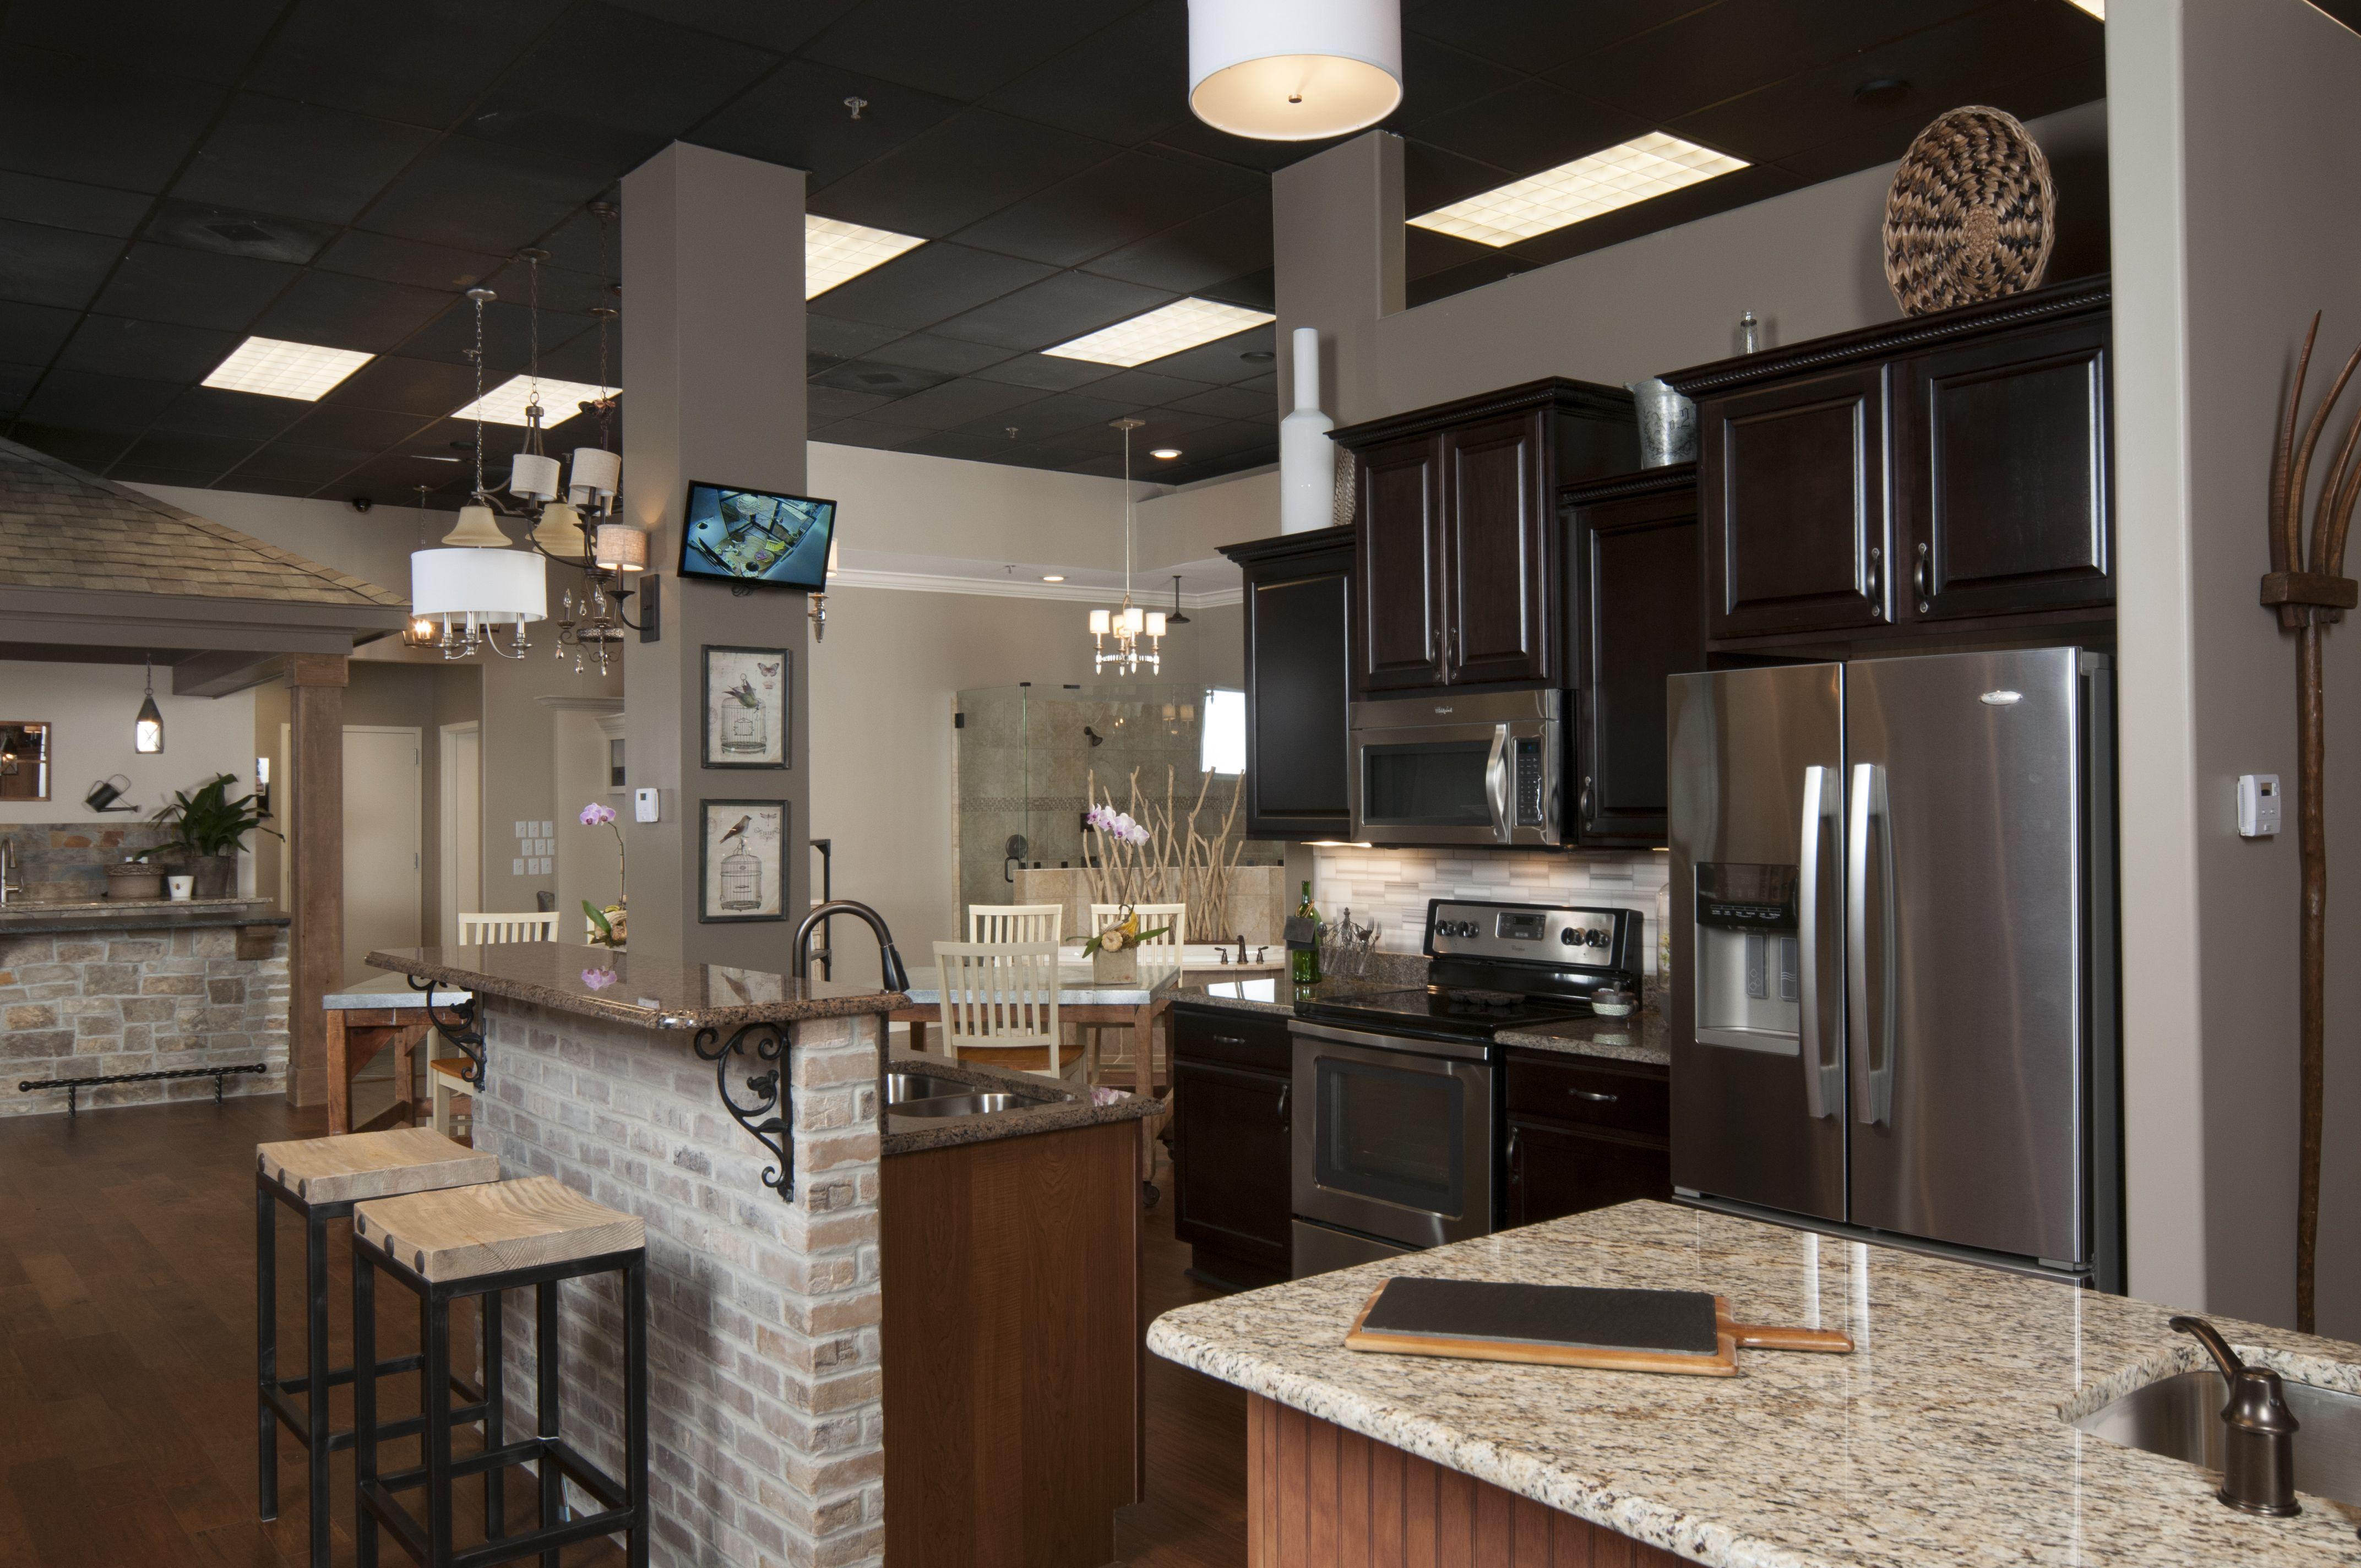 Regency Homebuilders New Homes In Memphis Tn Kitchen Design Kitchen Building A House